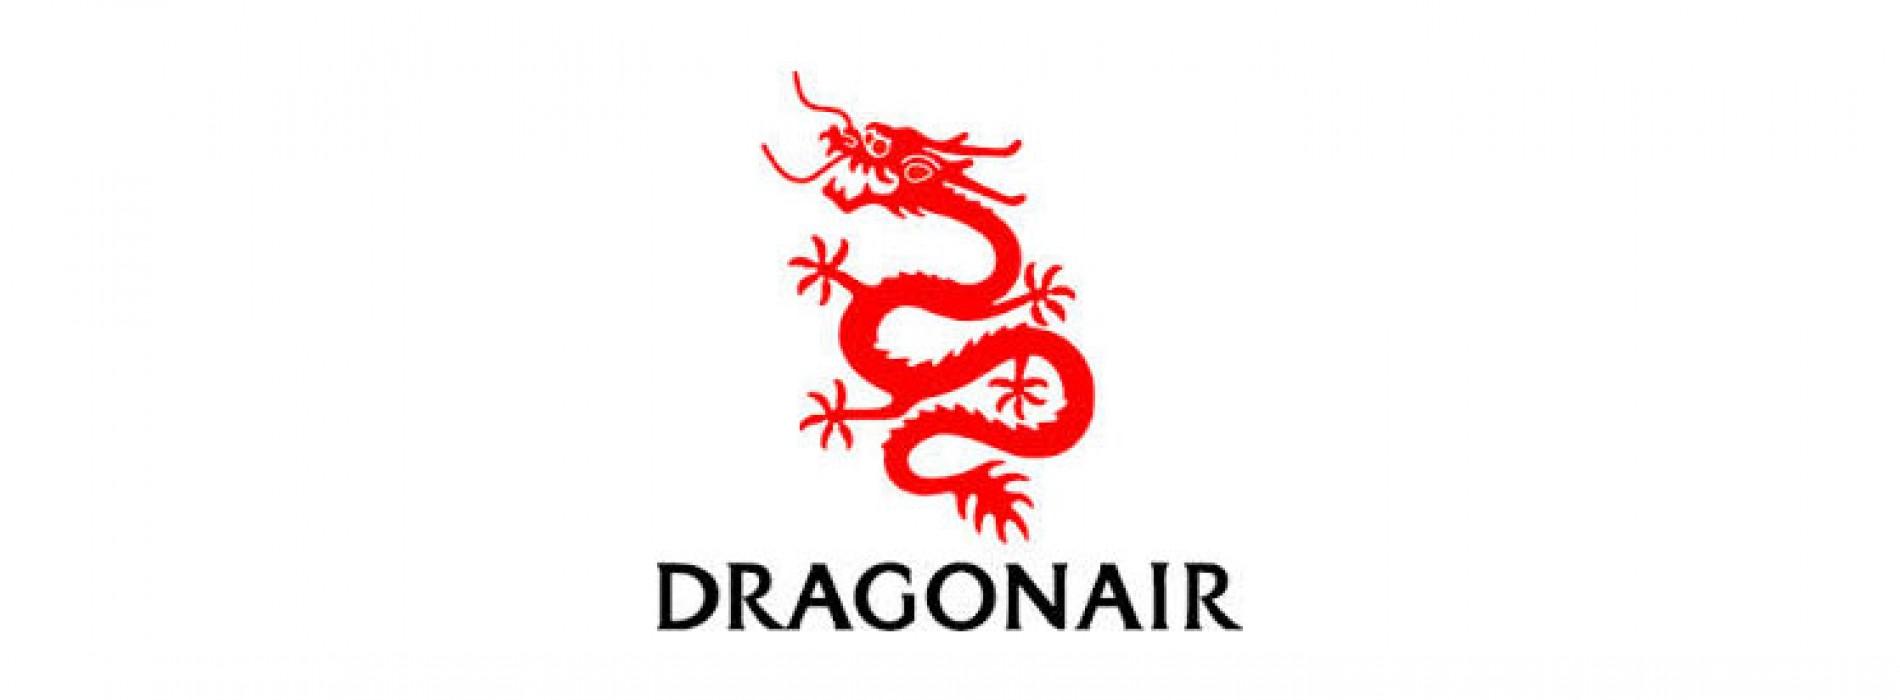 Dragonair introduces self-print boarding pass for passengers departing from Bengaluru